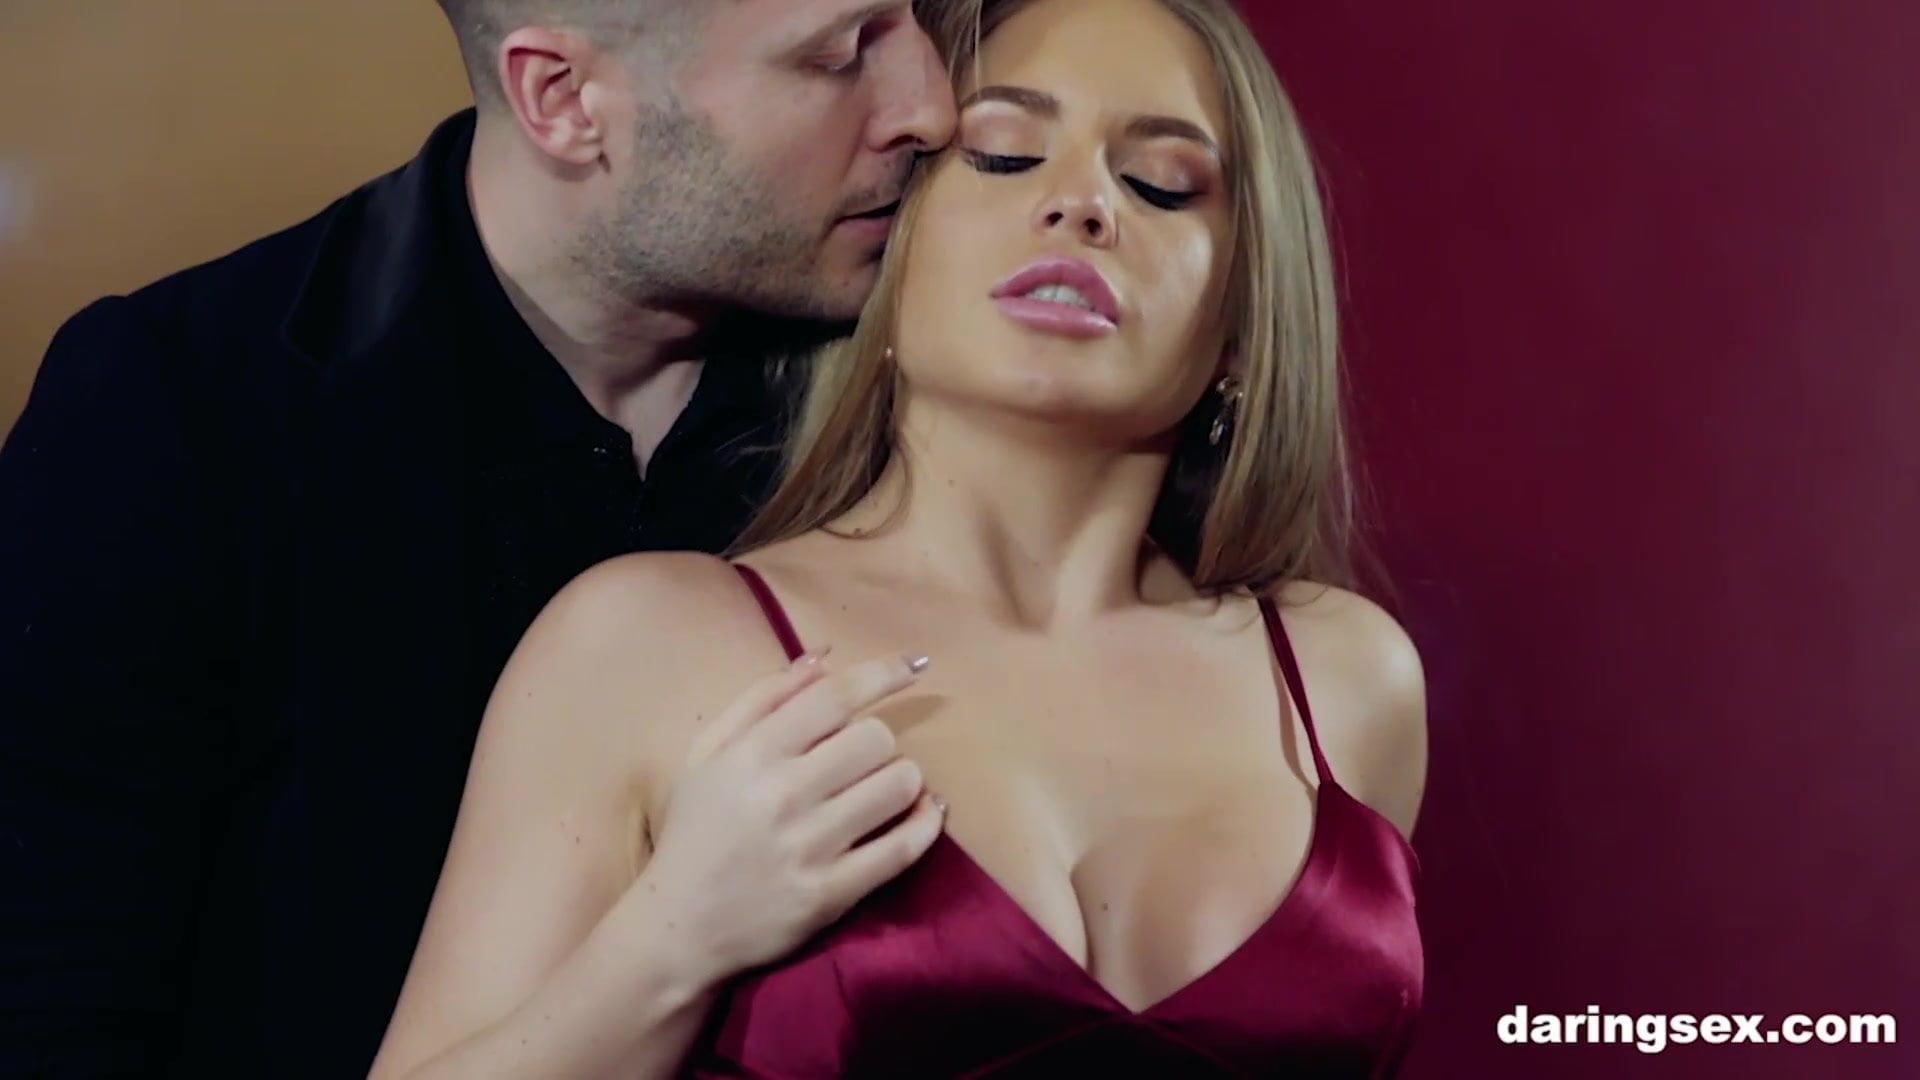 Alessandra Jane Porn Gangbang alessandra jane get picked up and hardcore fucked